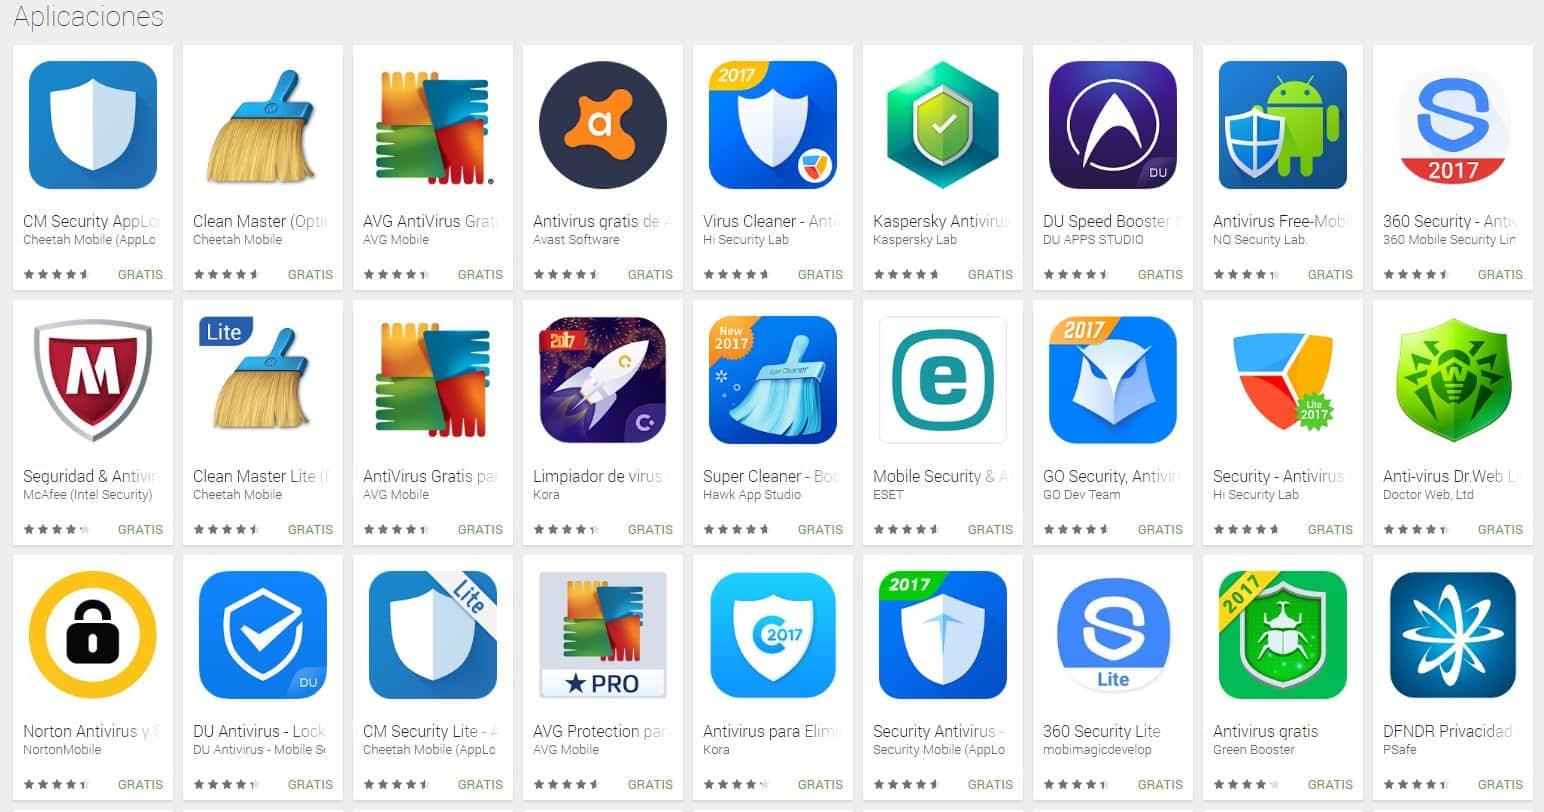 Aplicaciones de antivirus móvil